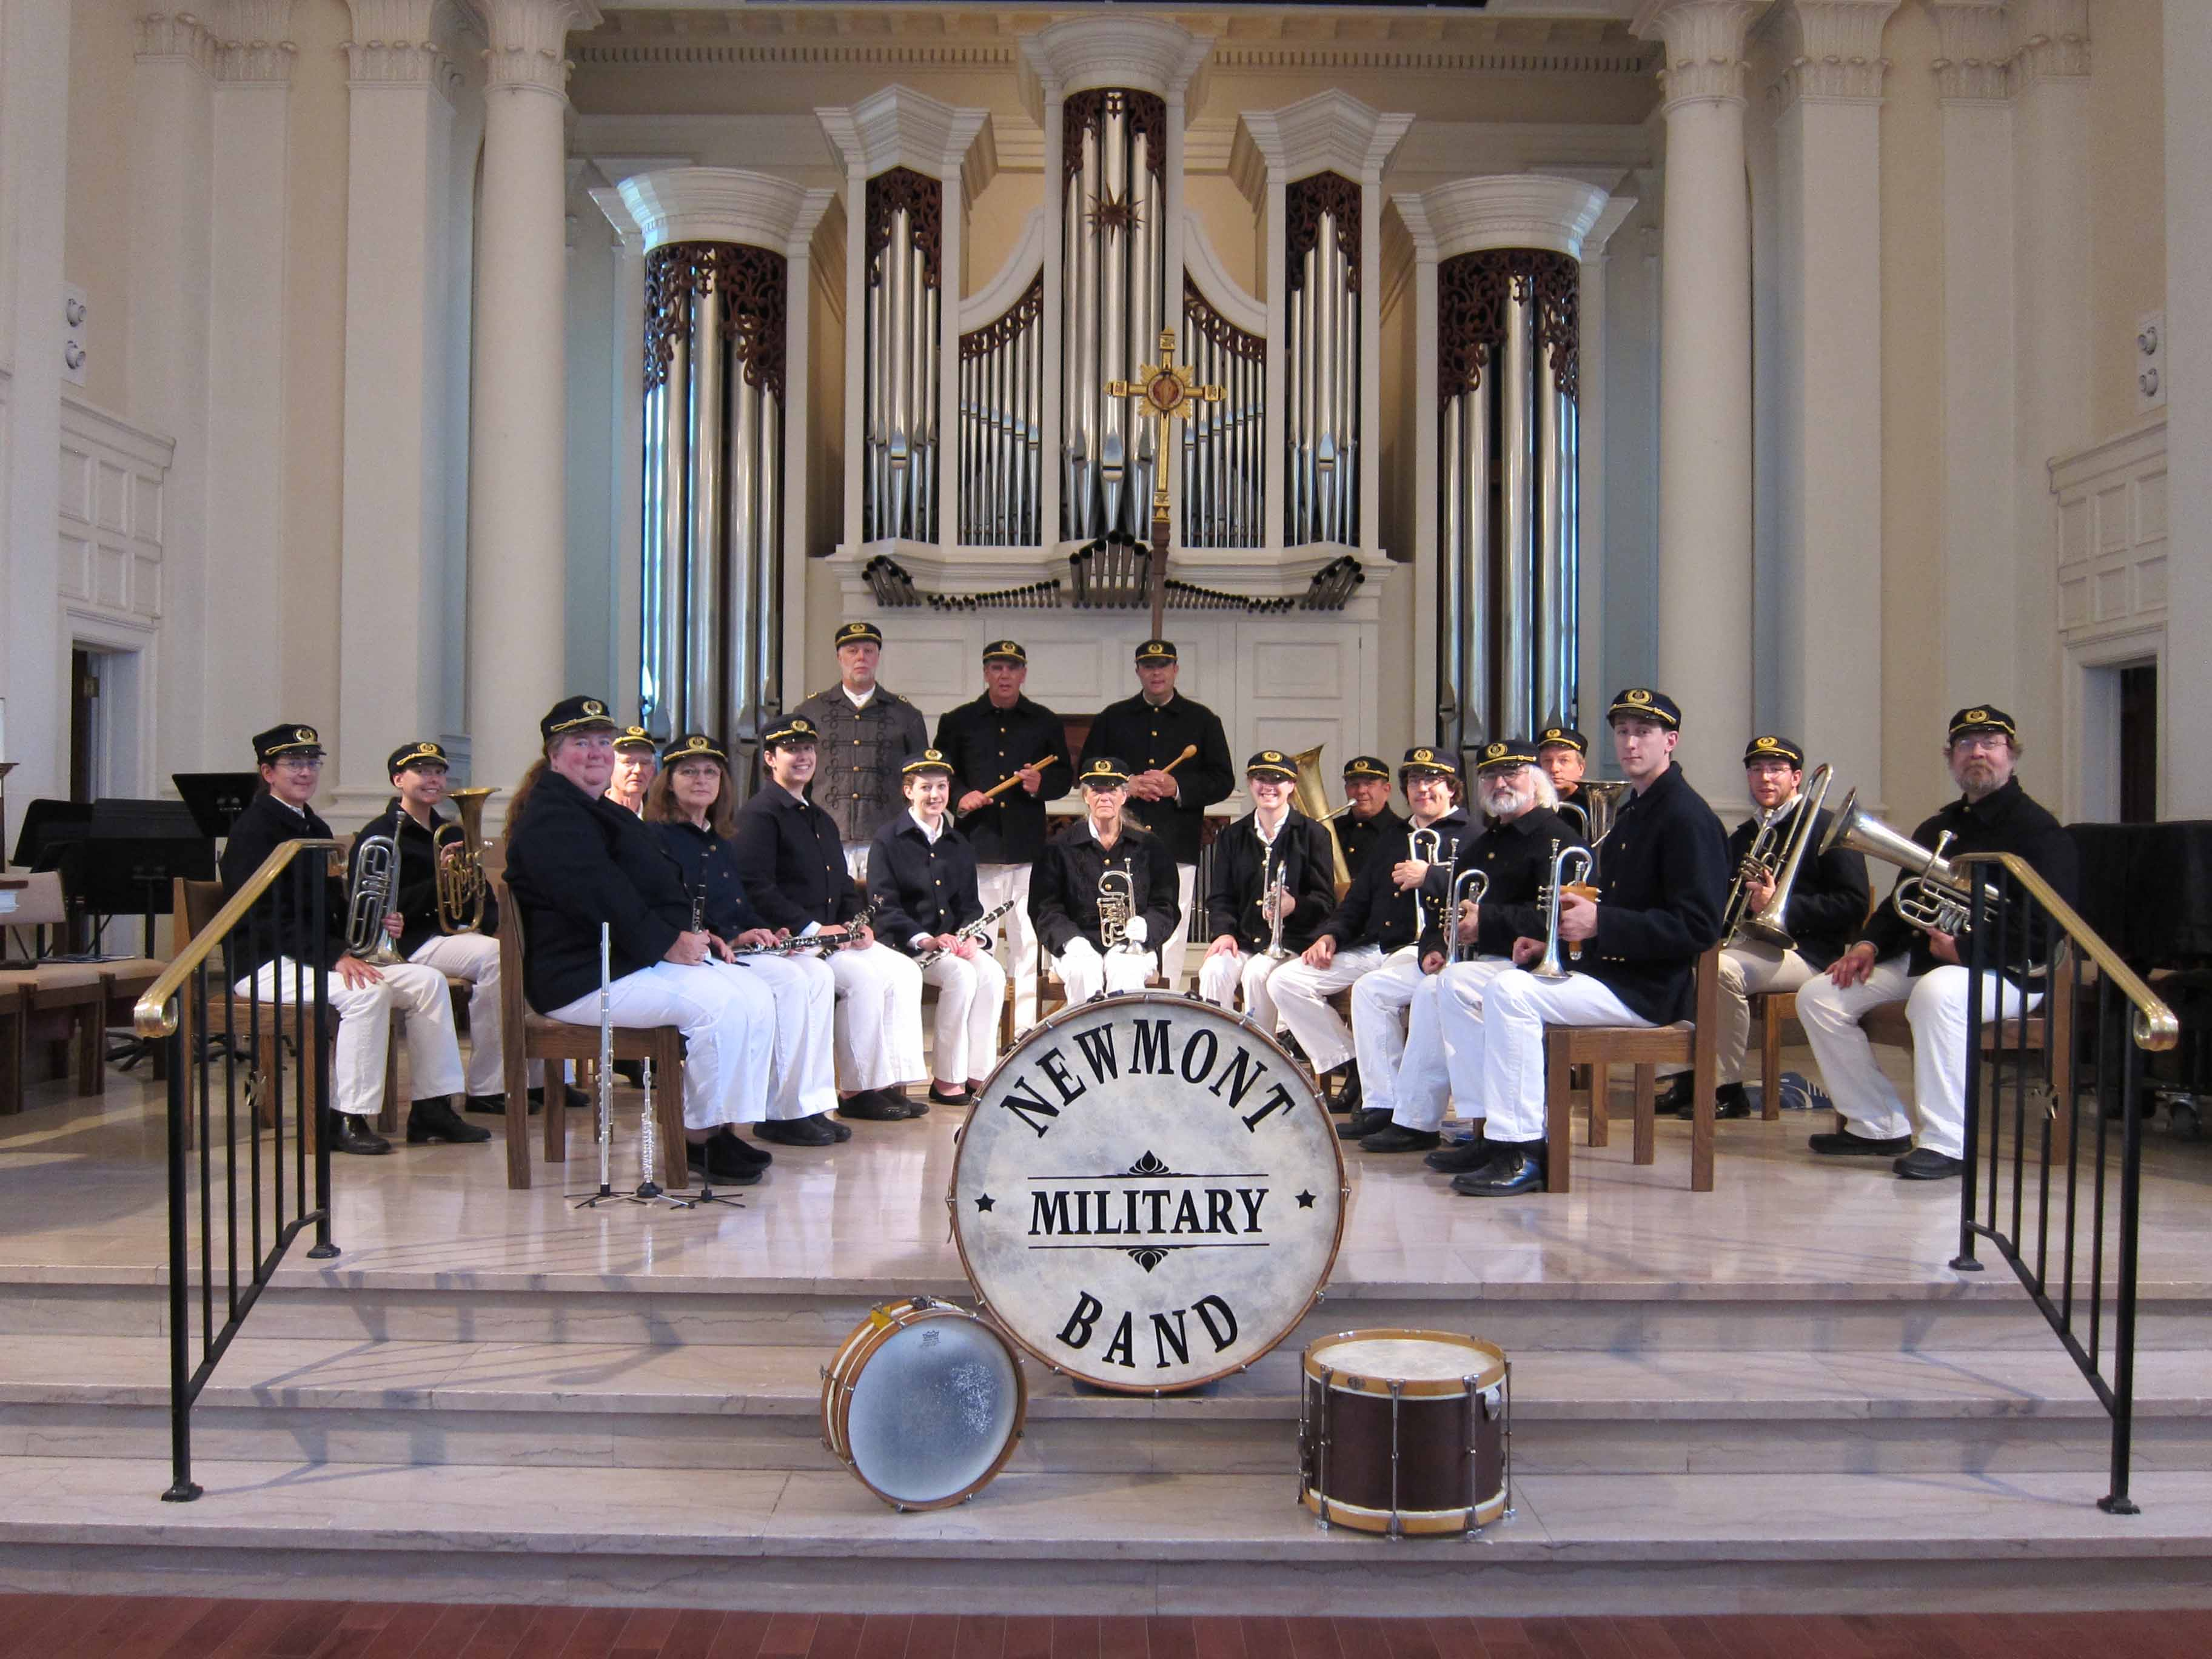 Newmont Band gettysburg